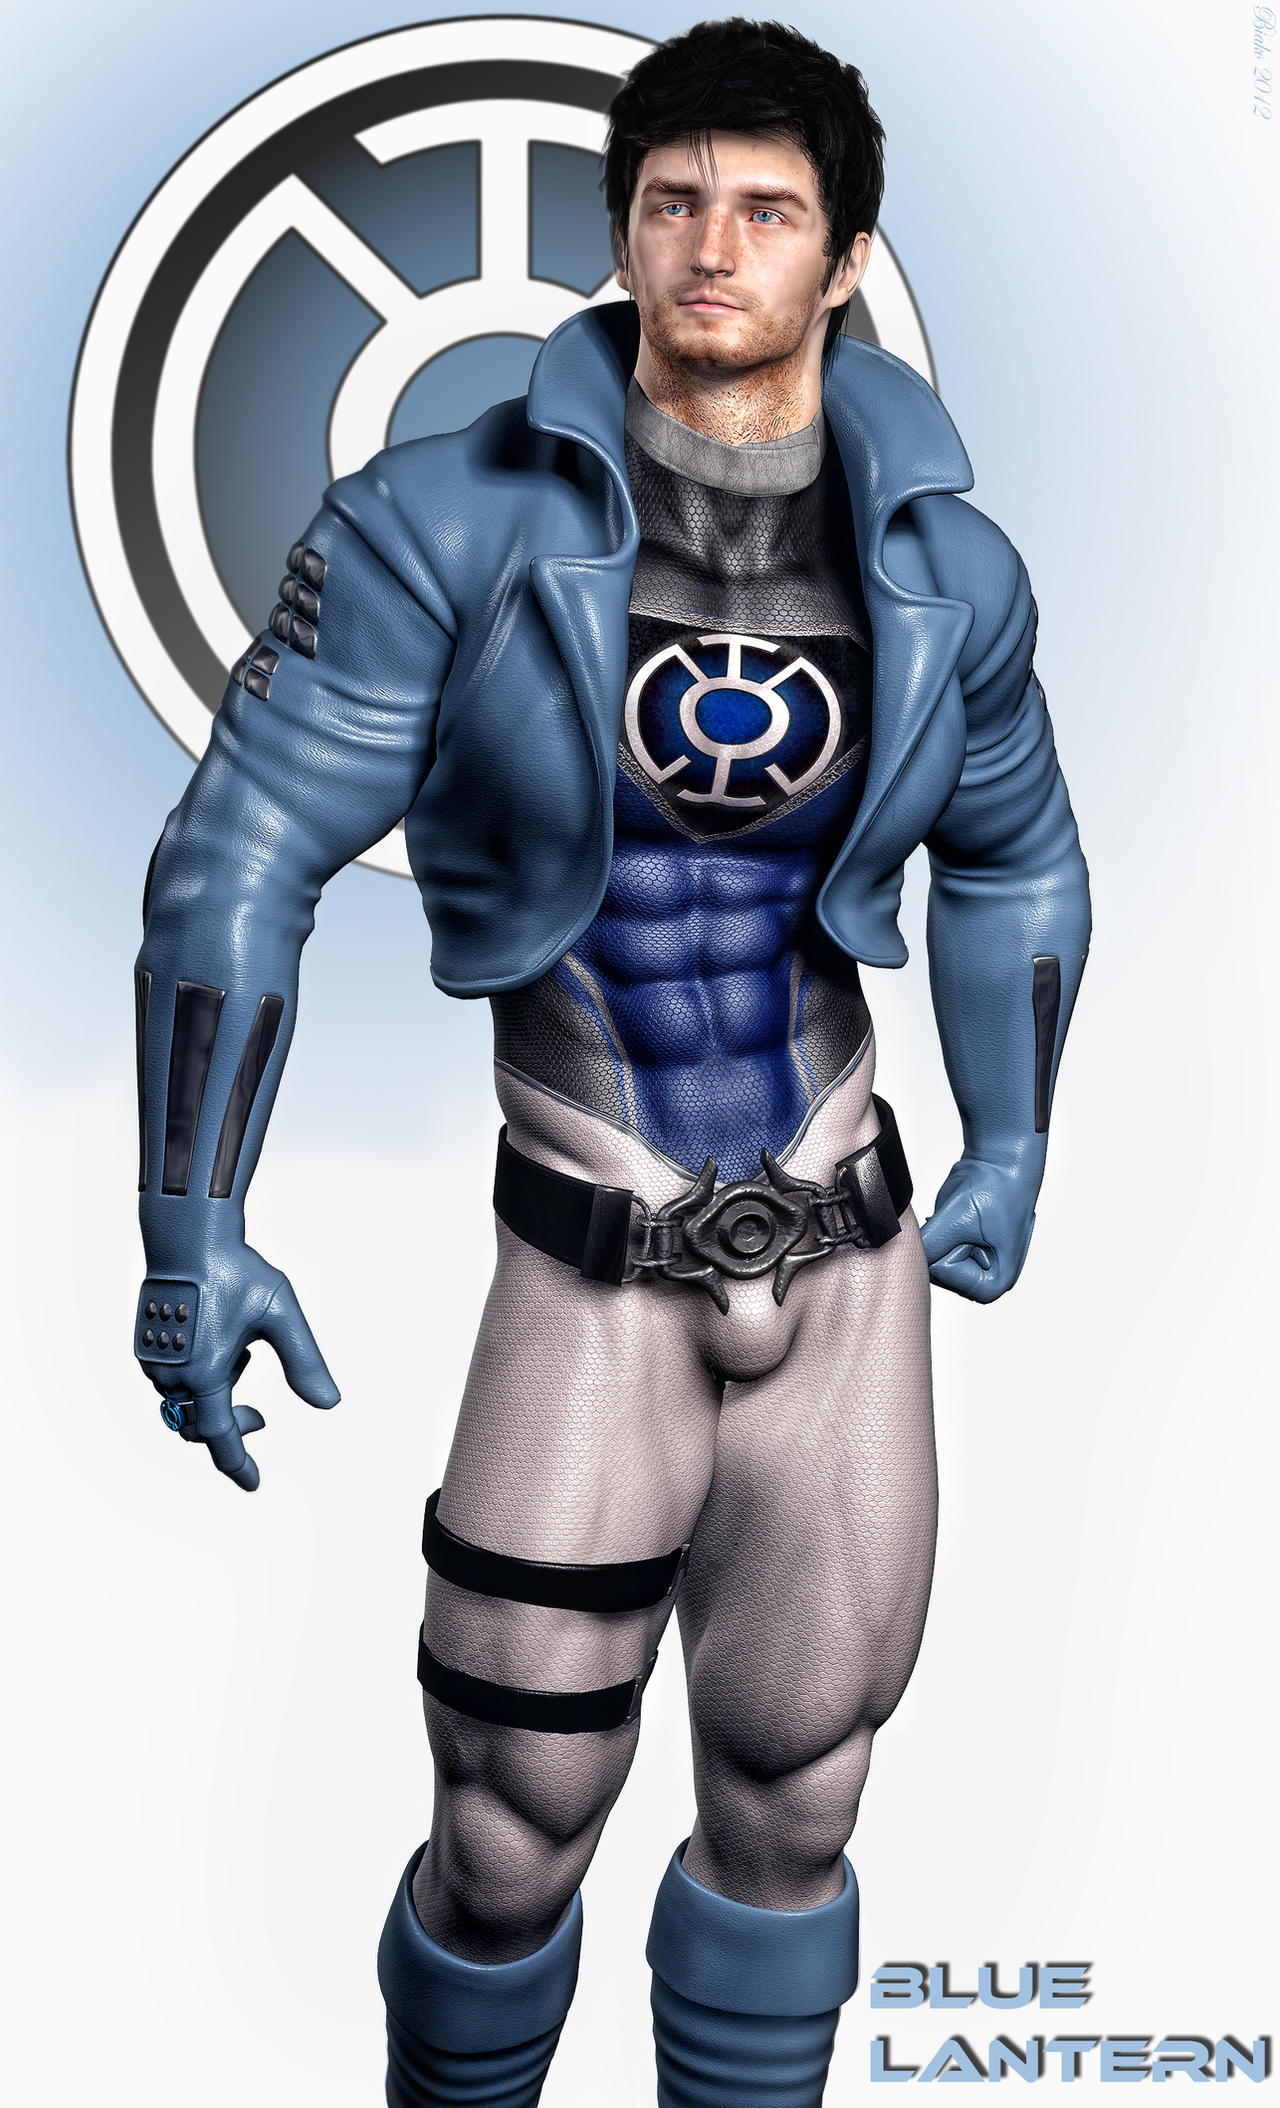 Blue Lantern Re-imagined by Biako06